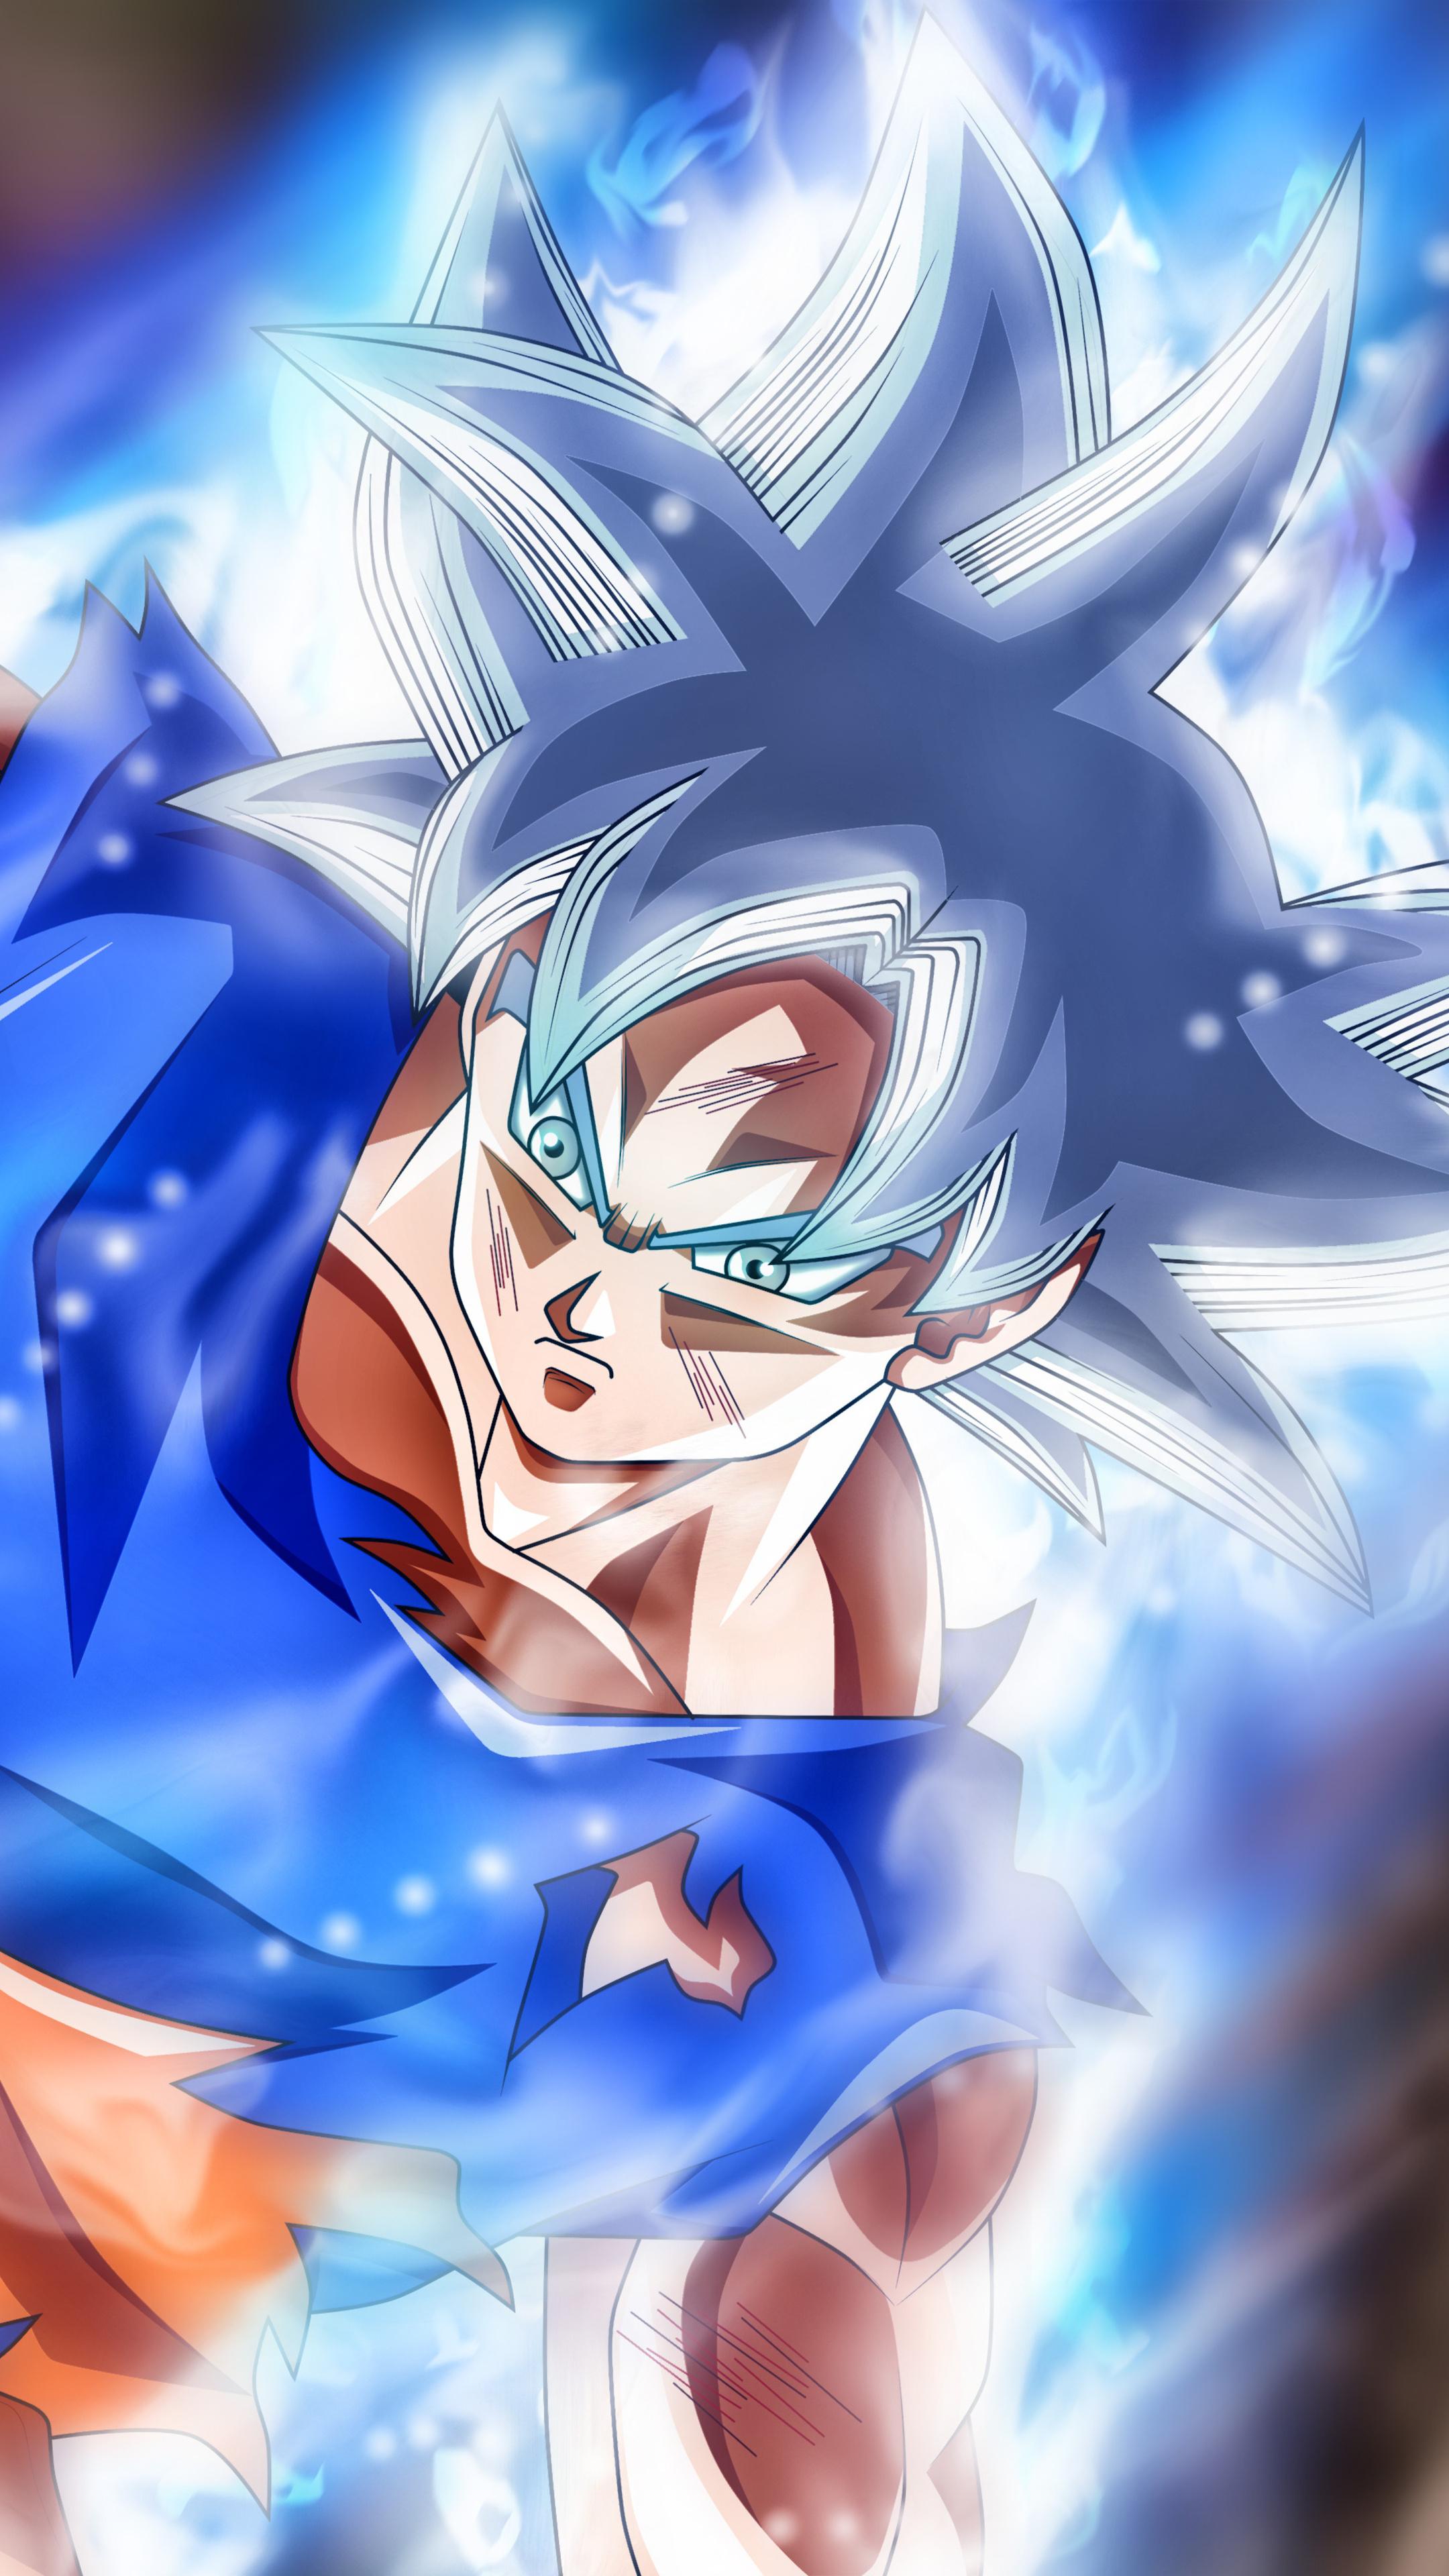 2160x3840 goku jiren masterd ultra instinct sony xperia x - Goku ultra instinct mastered wallpaper ...